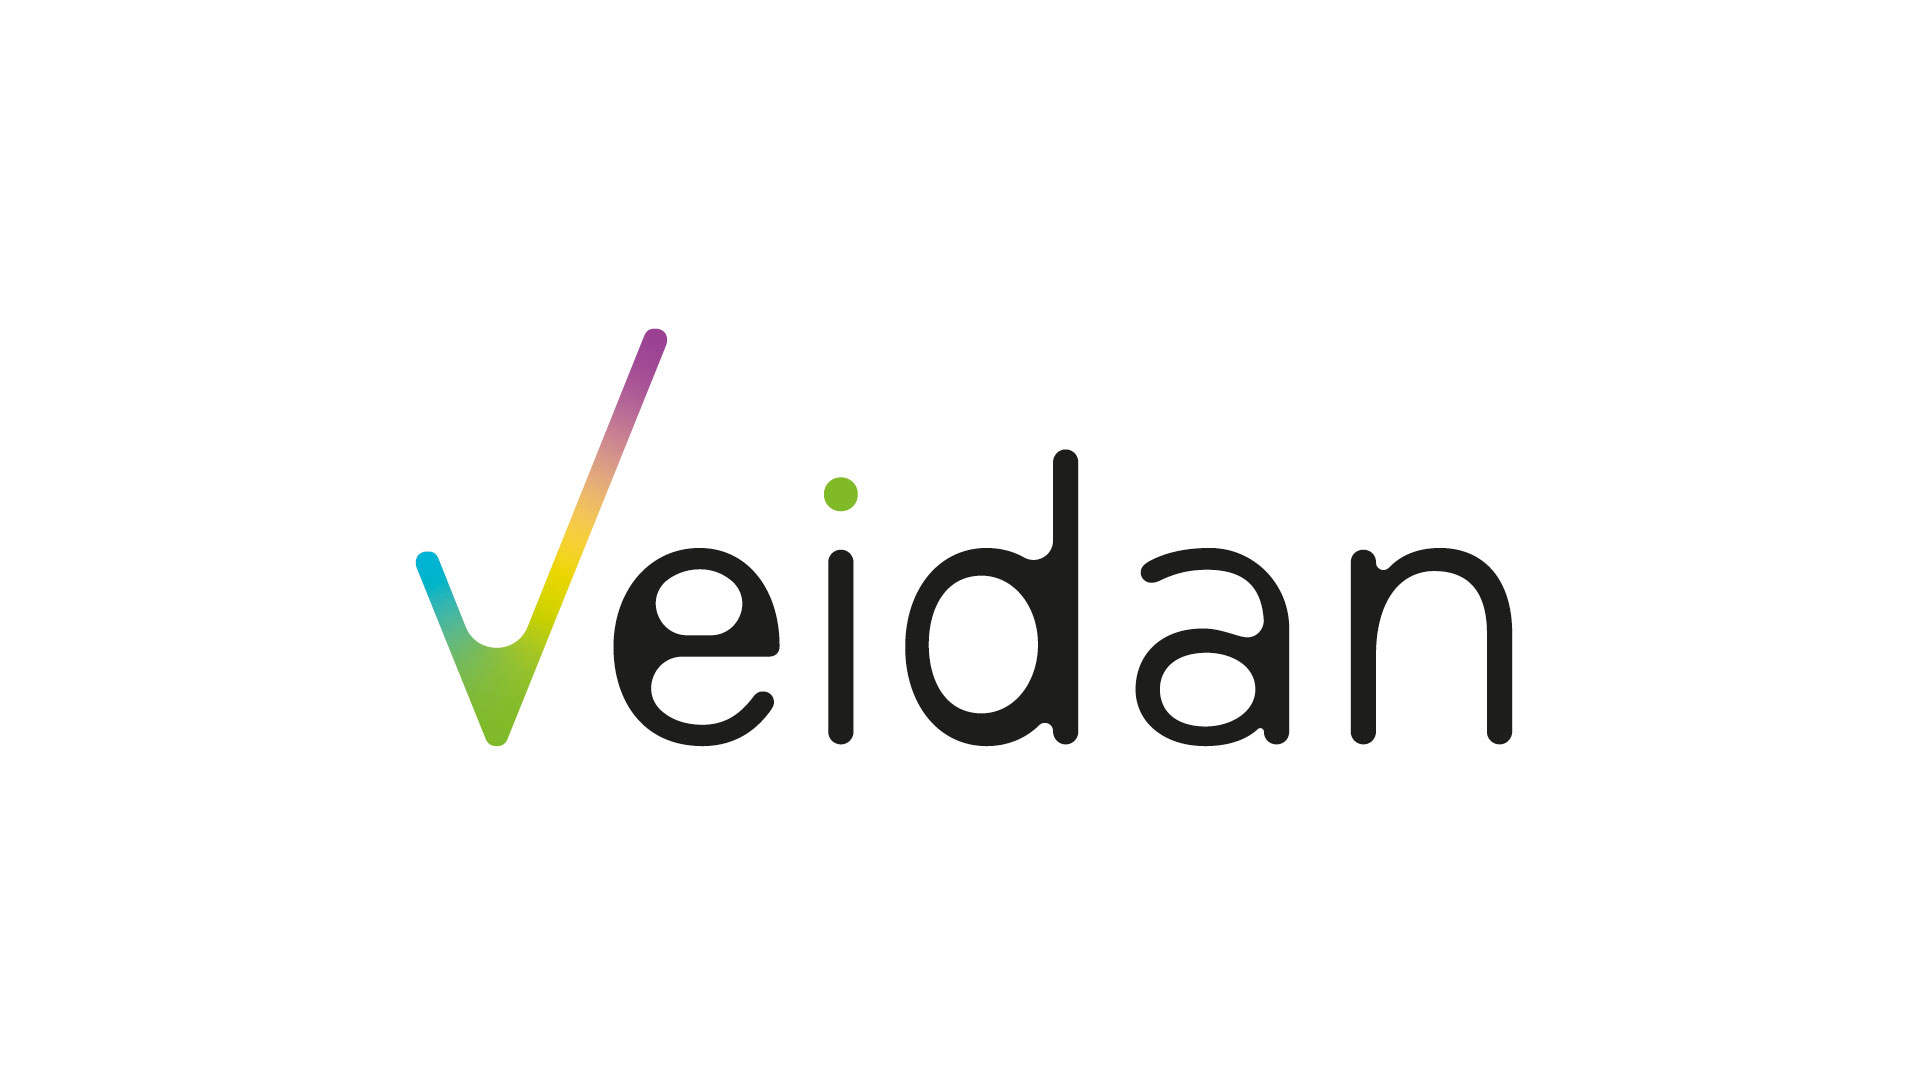 Logo-design-veidan-NotFromHere